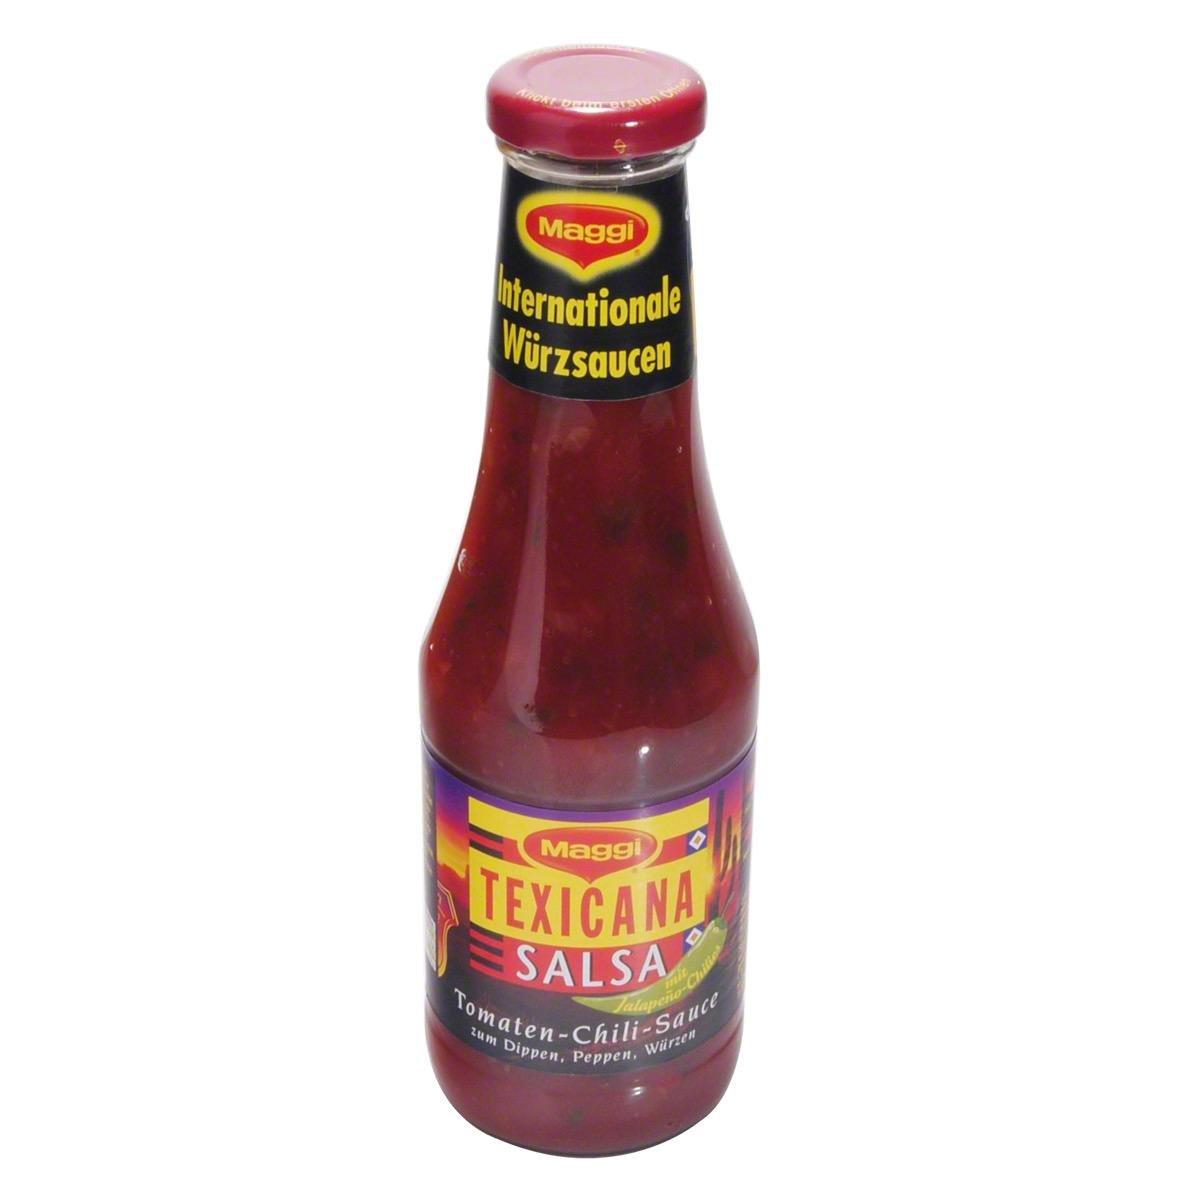 Maggi tomato salsa Texicana chili sauce 500 ml: Amazon.com: Grocery & Gourmet Food